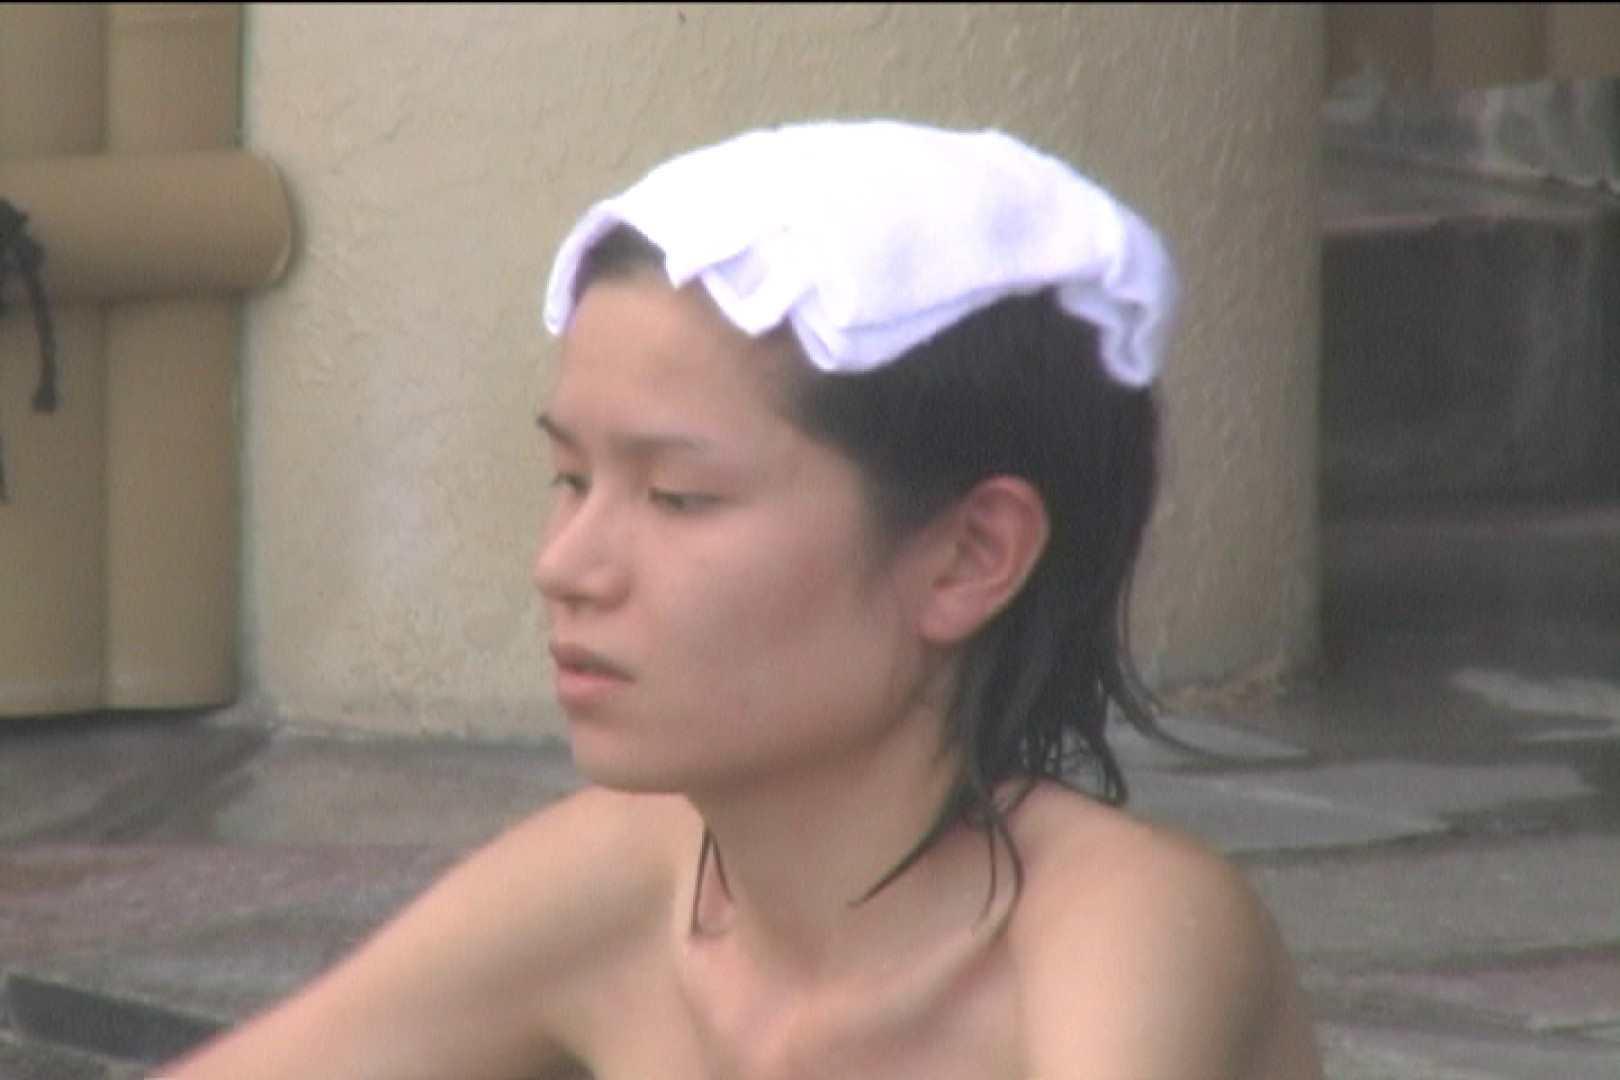 Aquaな露天風呂Vol.530 盗撮 | HなOL  88pic 59